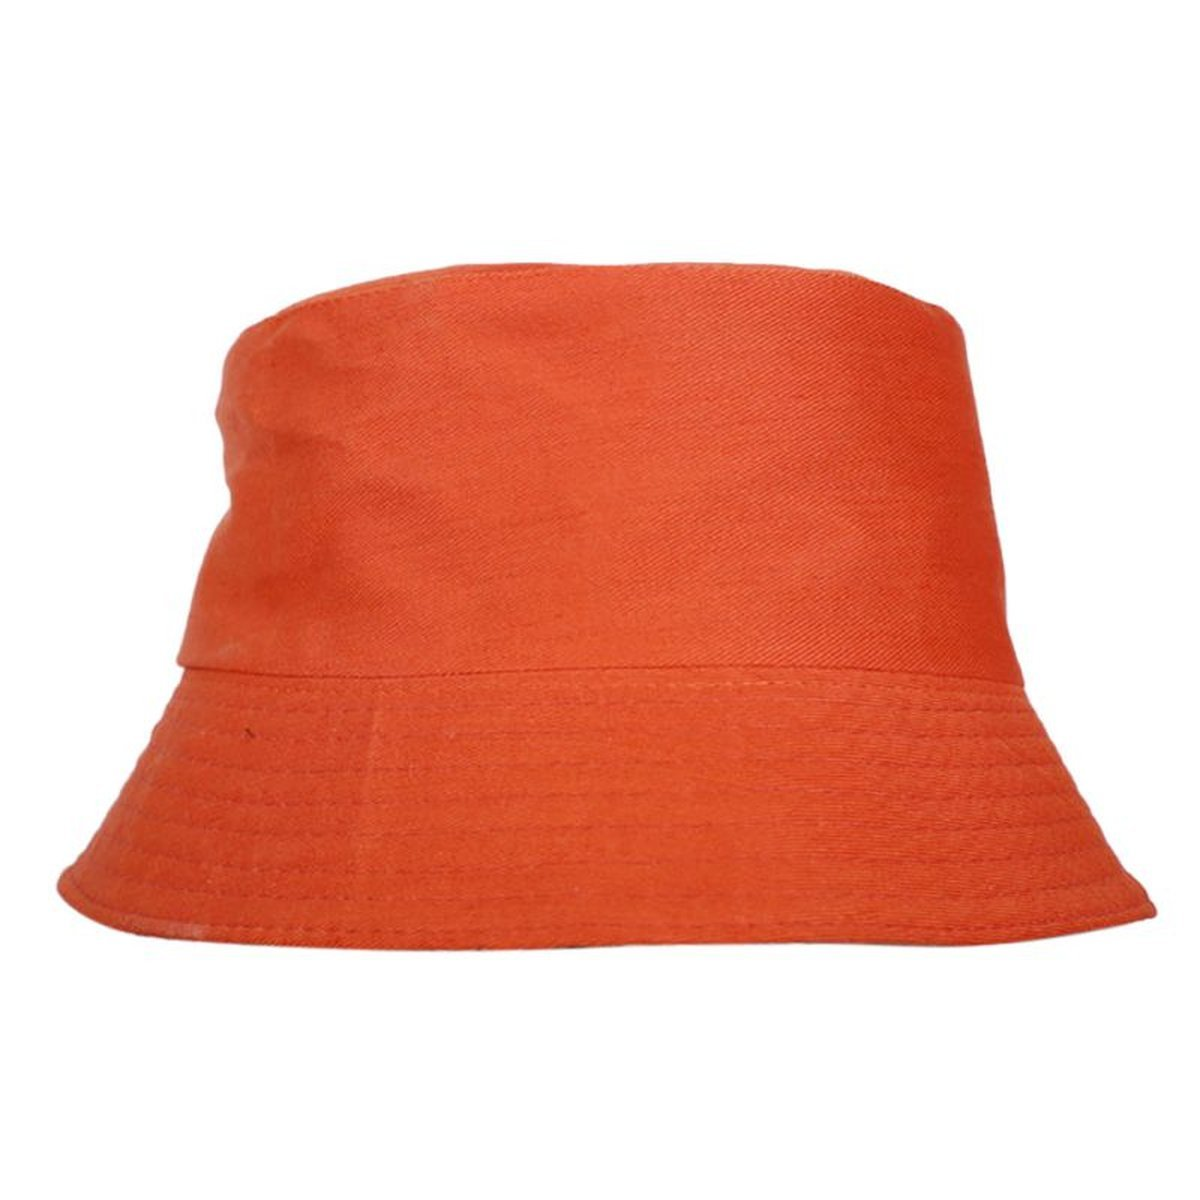 AOBRITON Travel Cap Summer Beach Hat Fisherman Bucket Hat Anti-UV Visor Lightweight